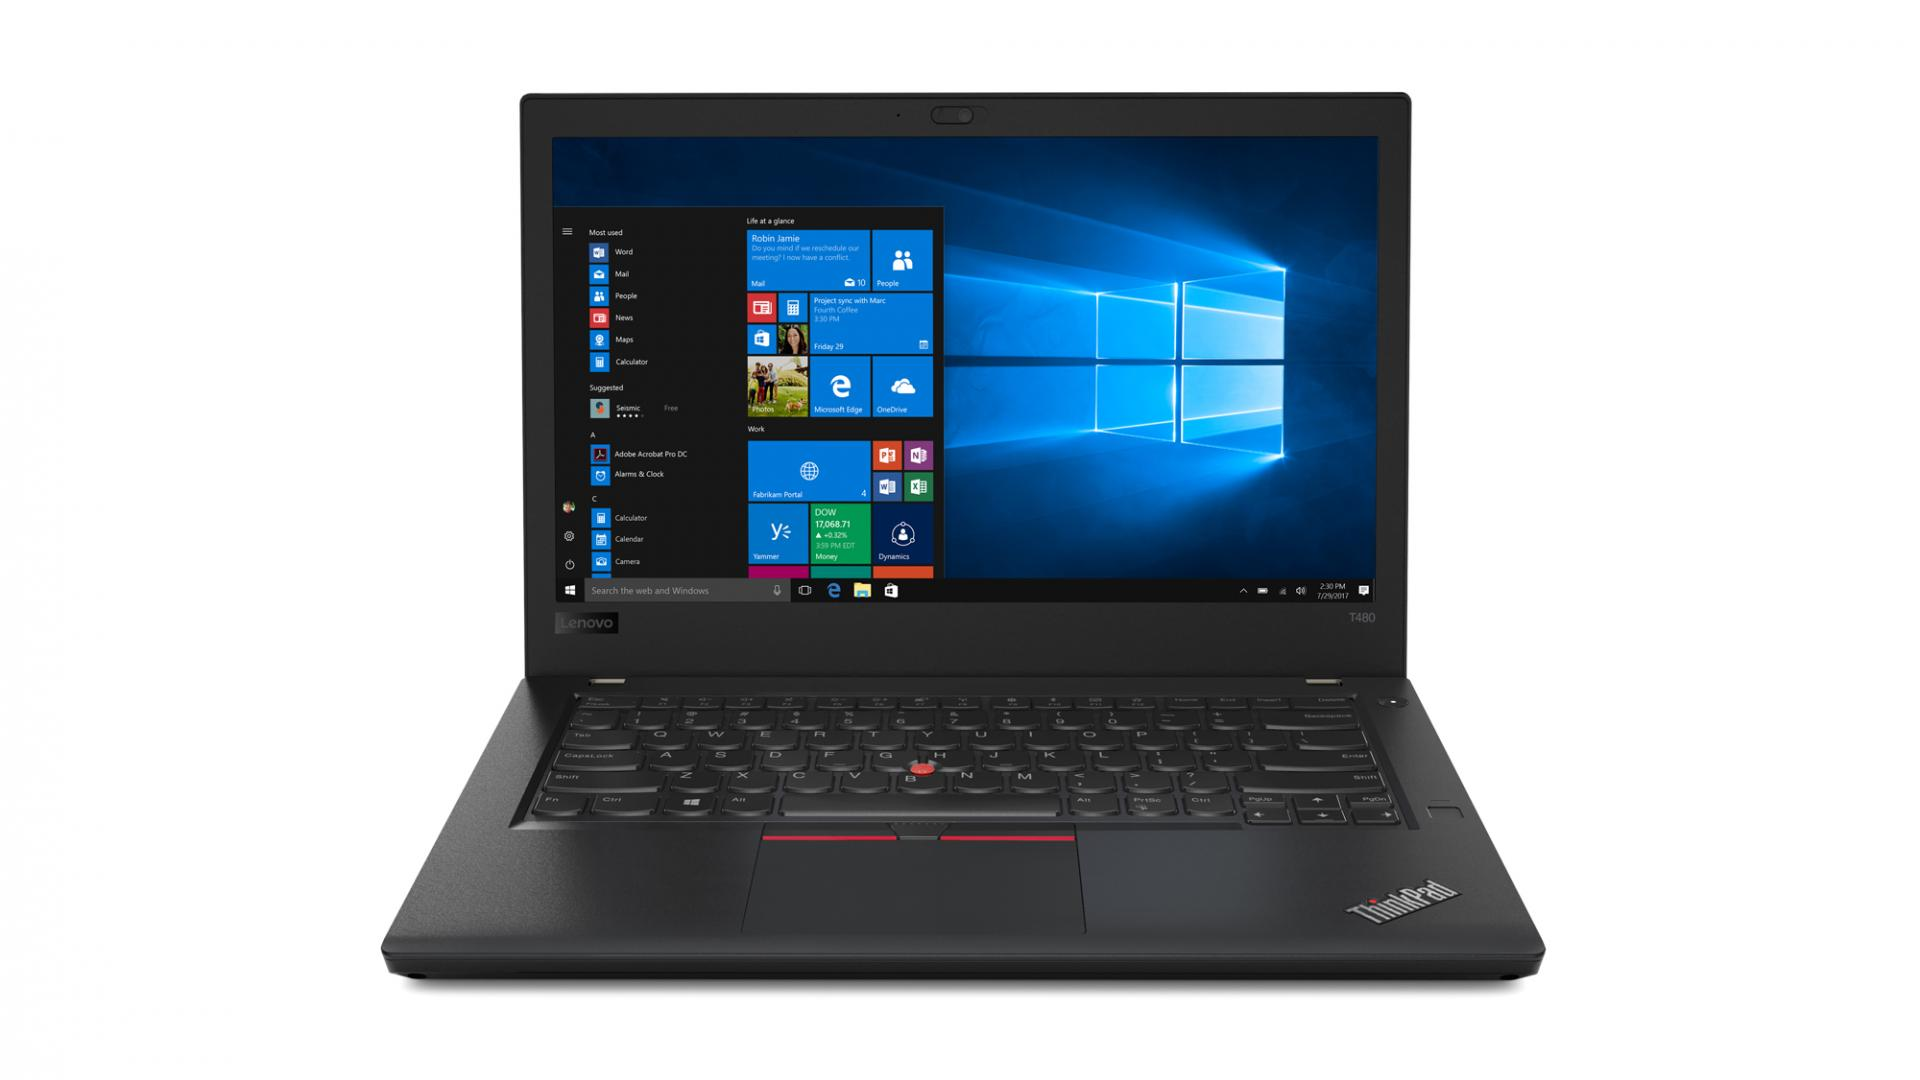 Lenovo анонсировала тройку ноутбуков ThinkPad: T480, T480s иT580